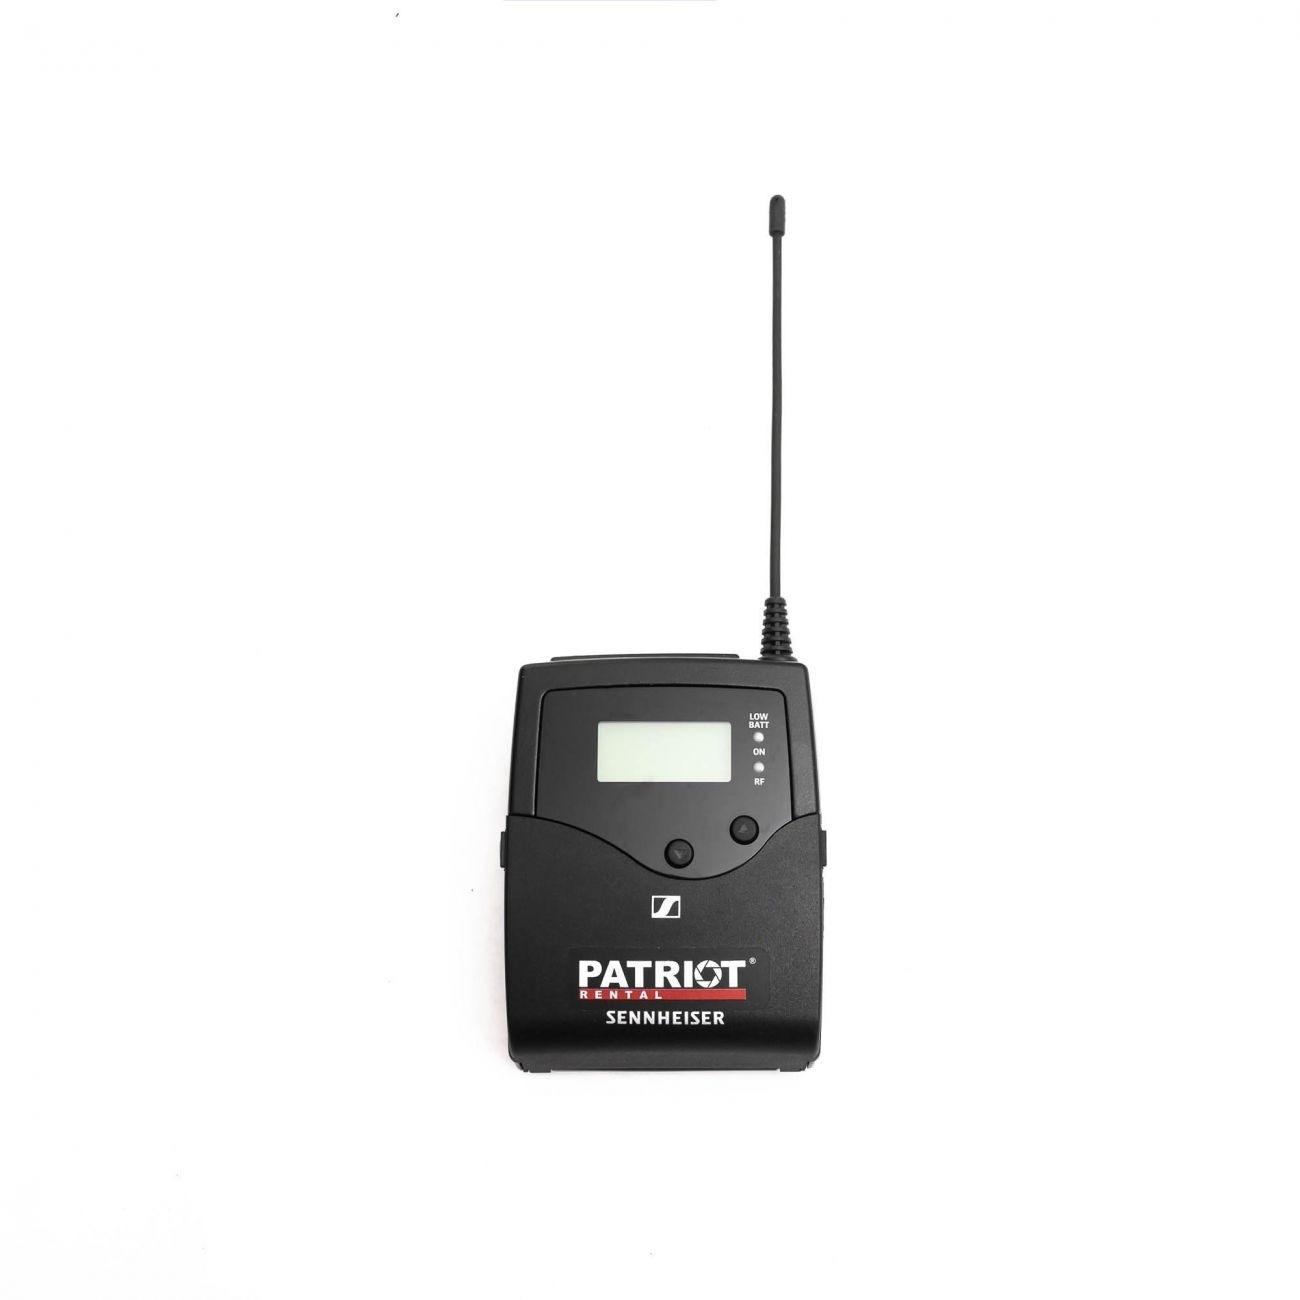 Diversity receiver Sennheiser EK 500 G4 PR (558-626MHz)